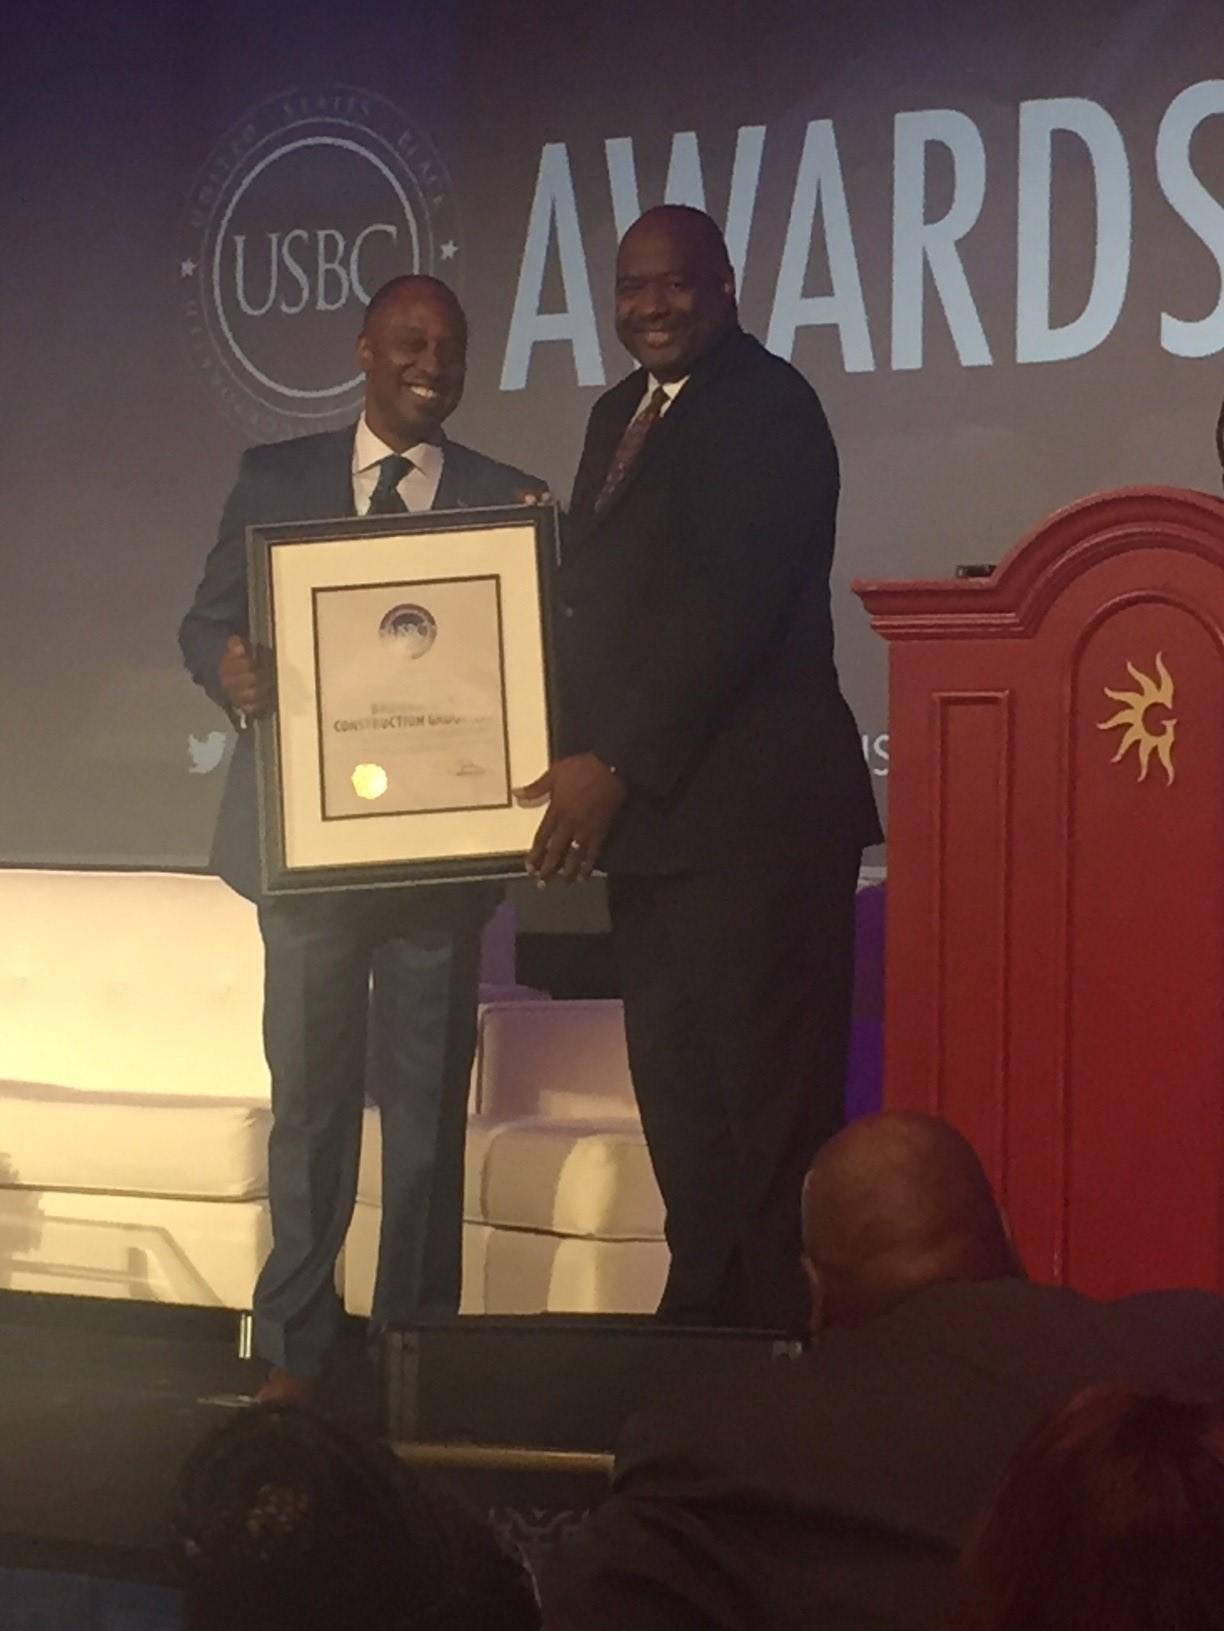 USBC Award 2.jpg